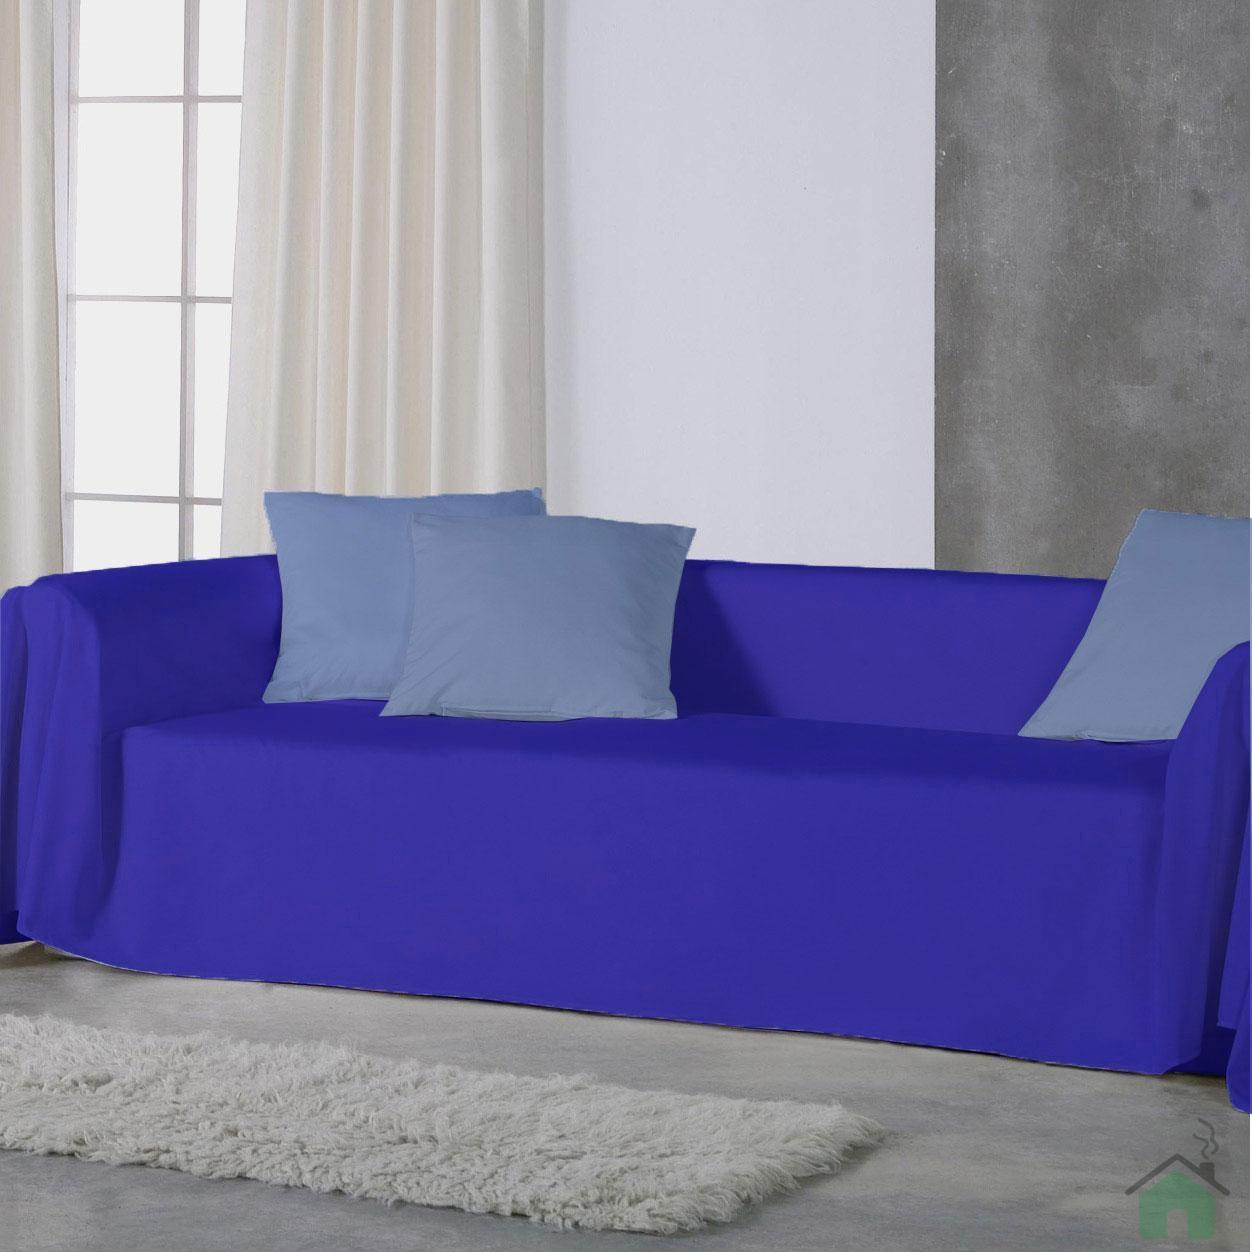 Copridivano telo arredo panama 100 cotone tinta unita 3 misure 20 colori - Telo arredo divano ...